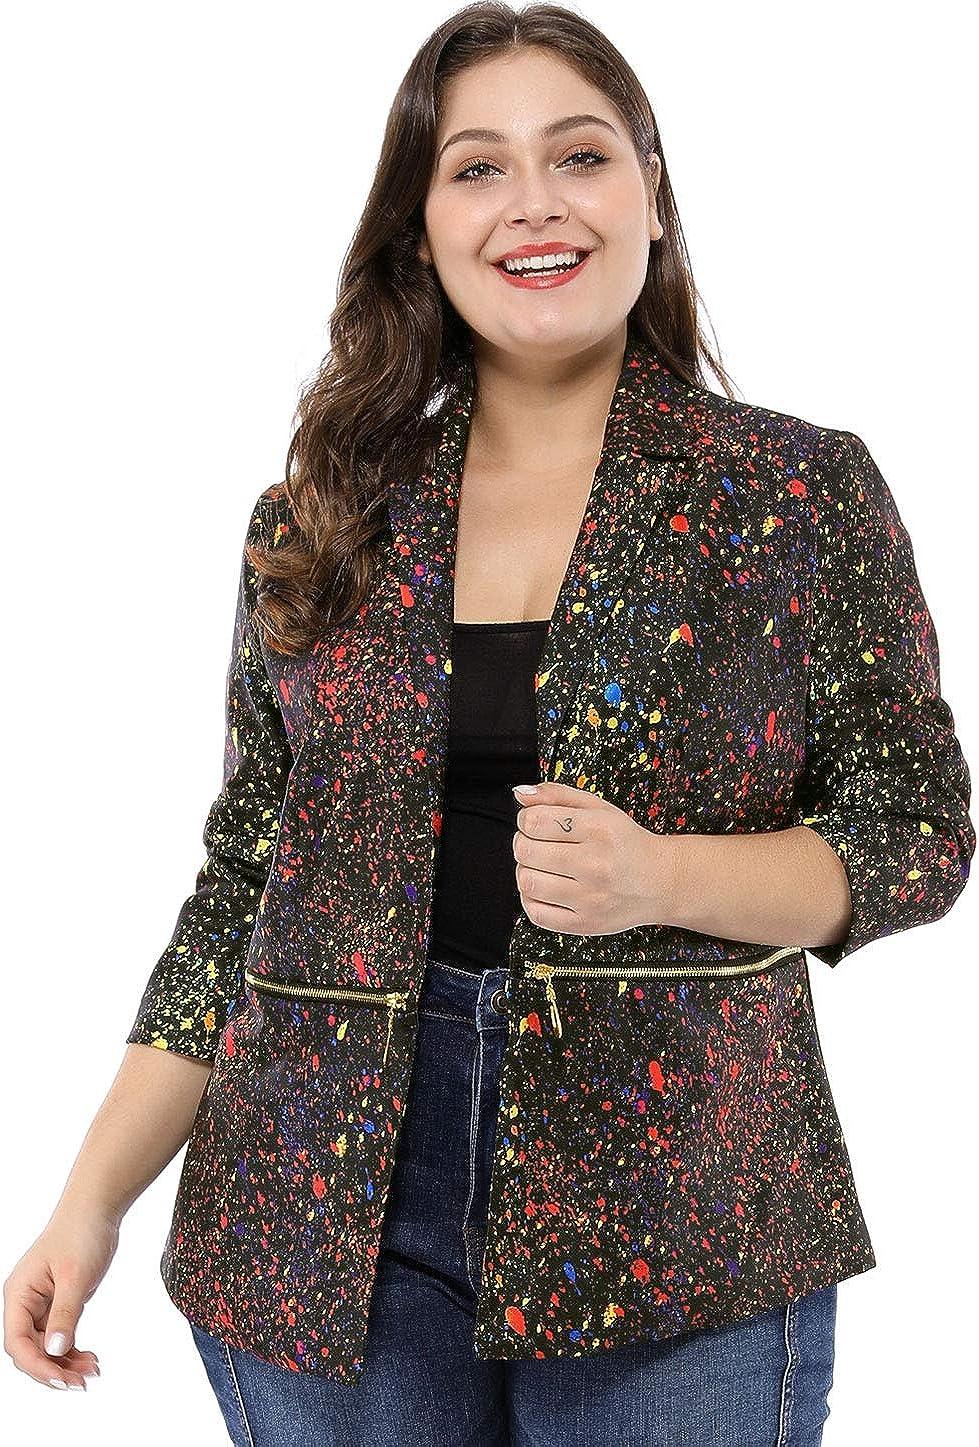 uxcell Women's Plus Size Bomber Jackets Paint Splatter Printed Blazer